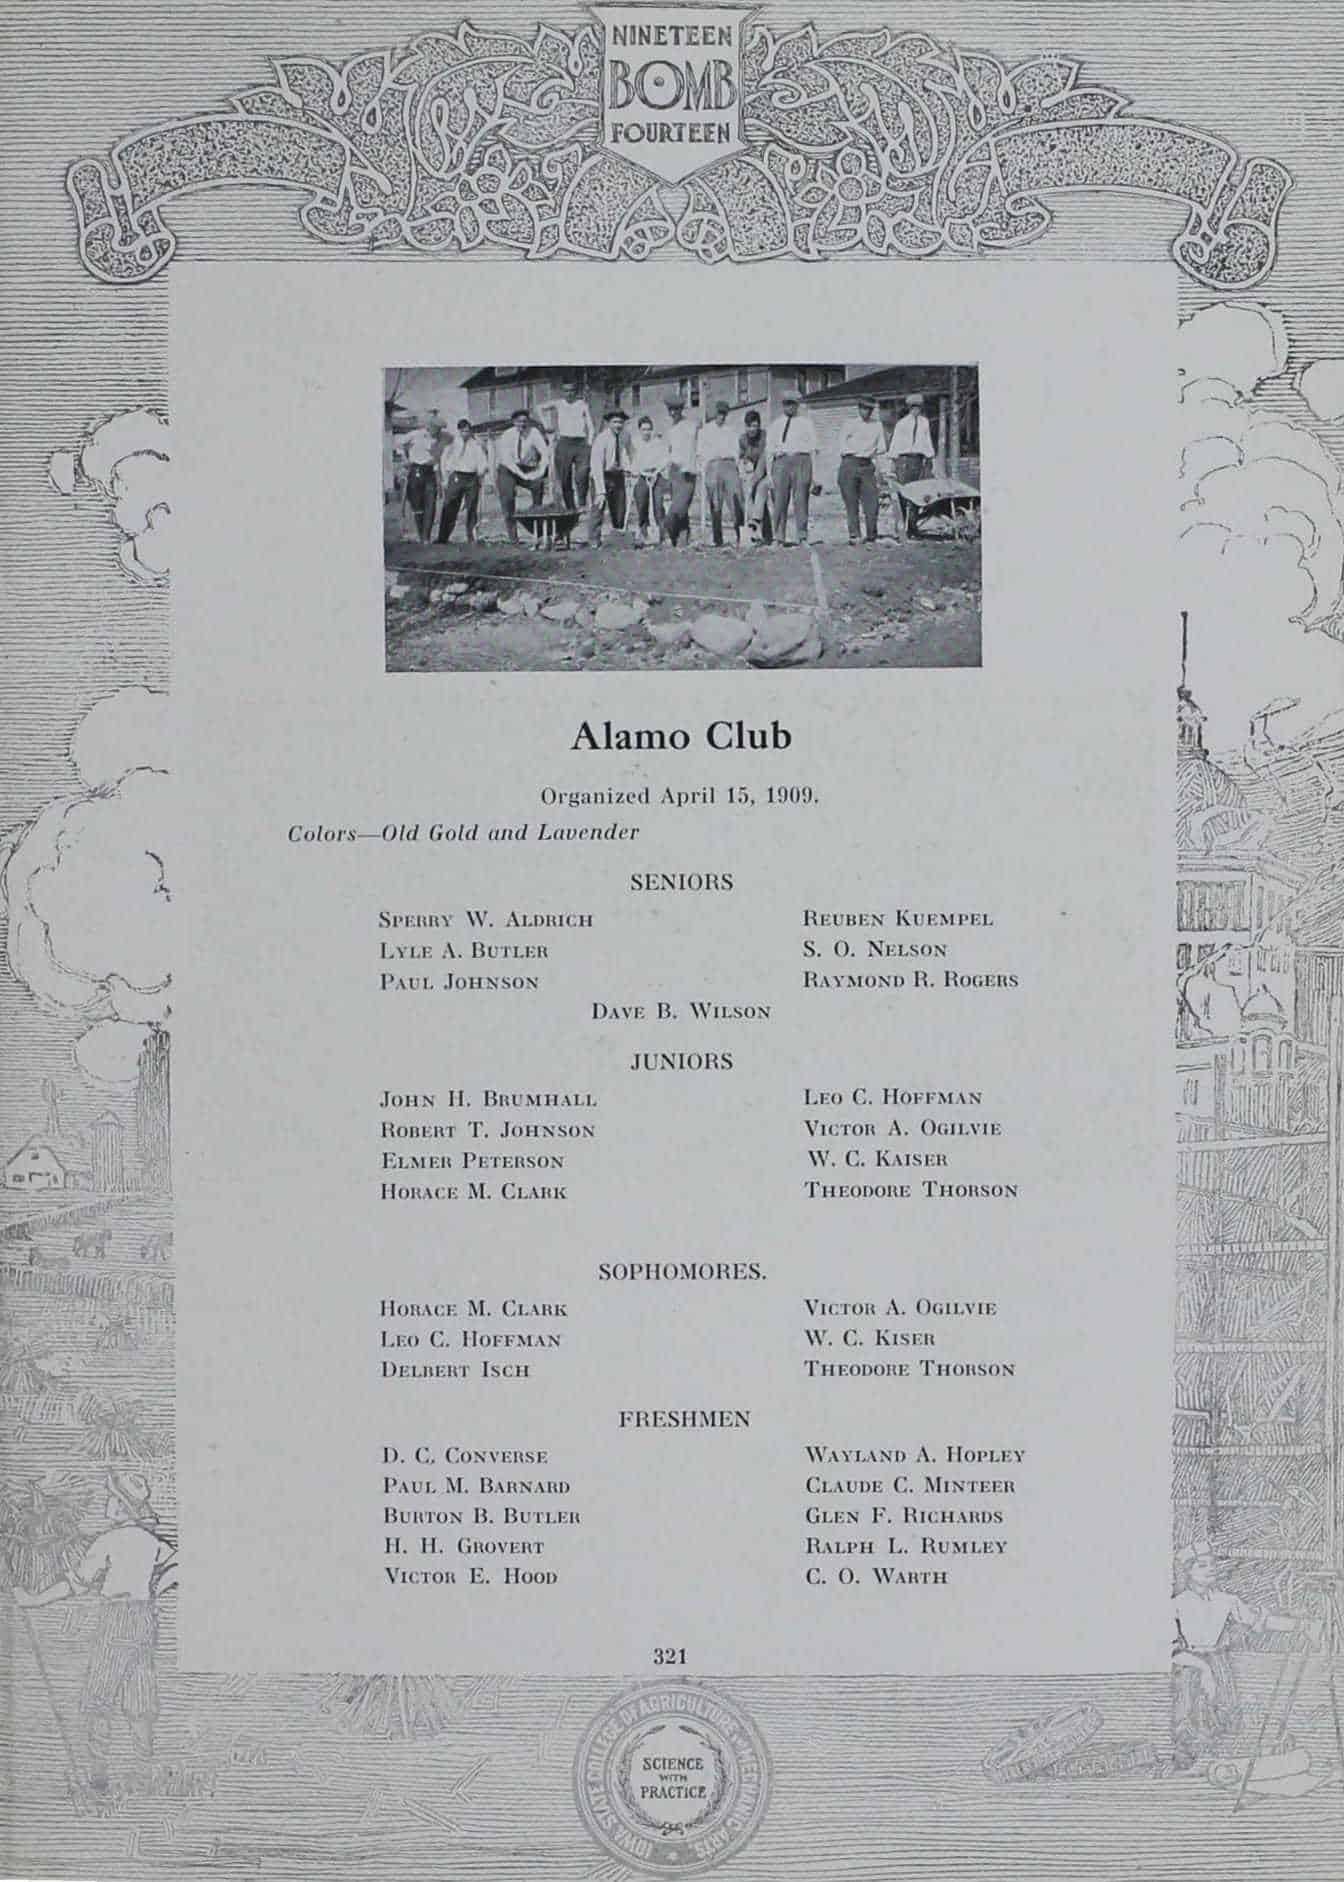 1913 Alamo Club Roster